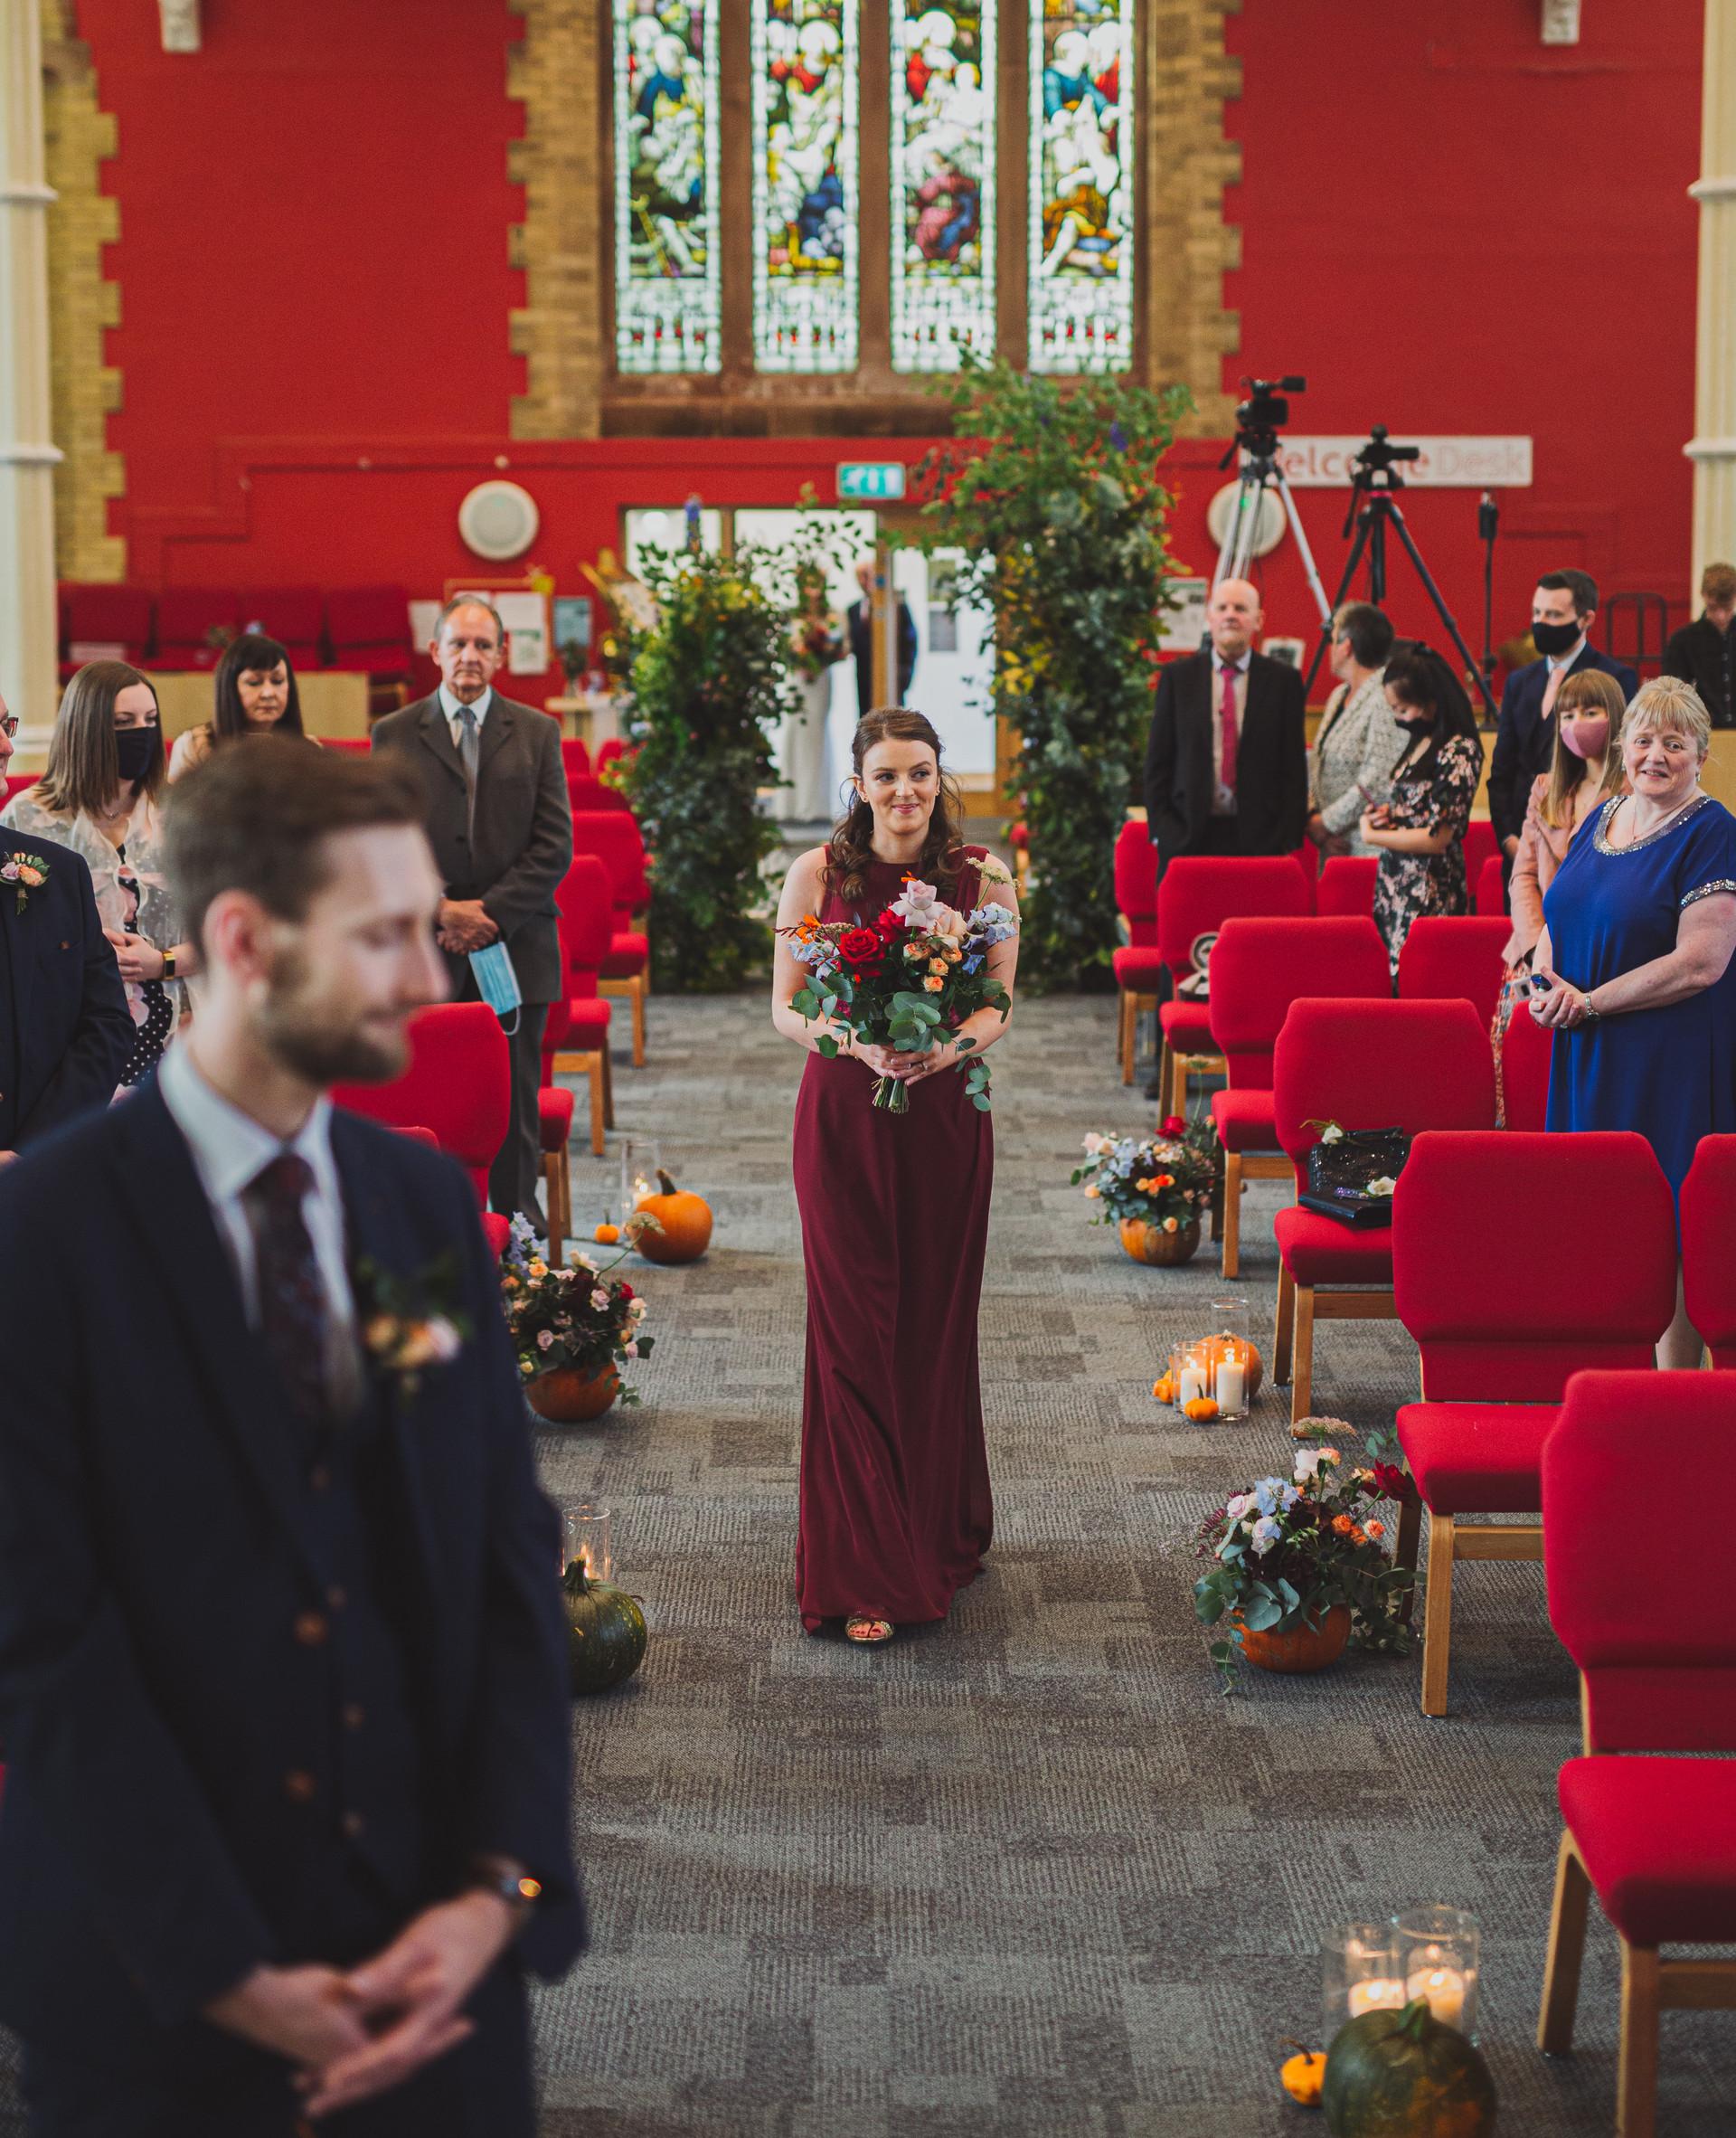 Church Wedding Decorations | Boho Bride | Quirky Wedding | Living Witness Weddings